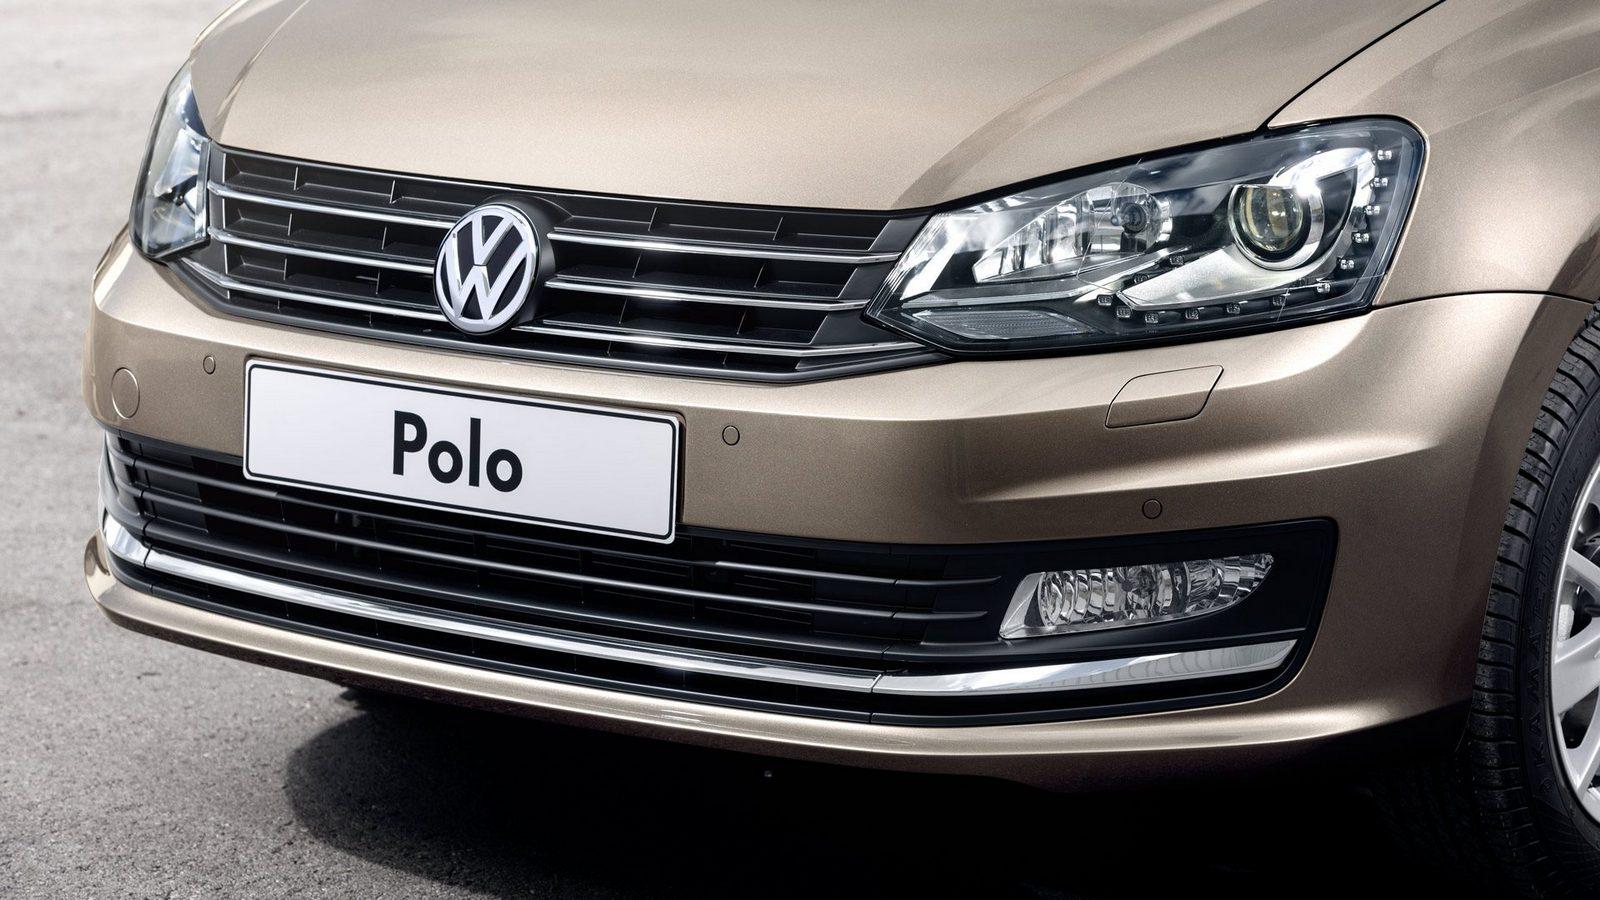 Плюсы и минусы Volkswagen Polo - Колеса.ру